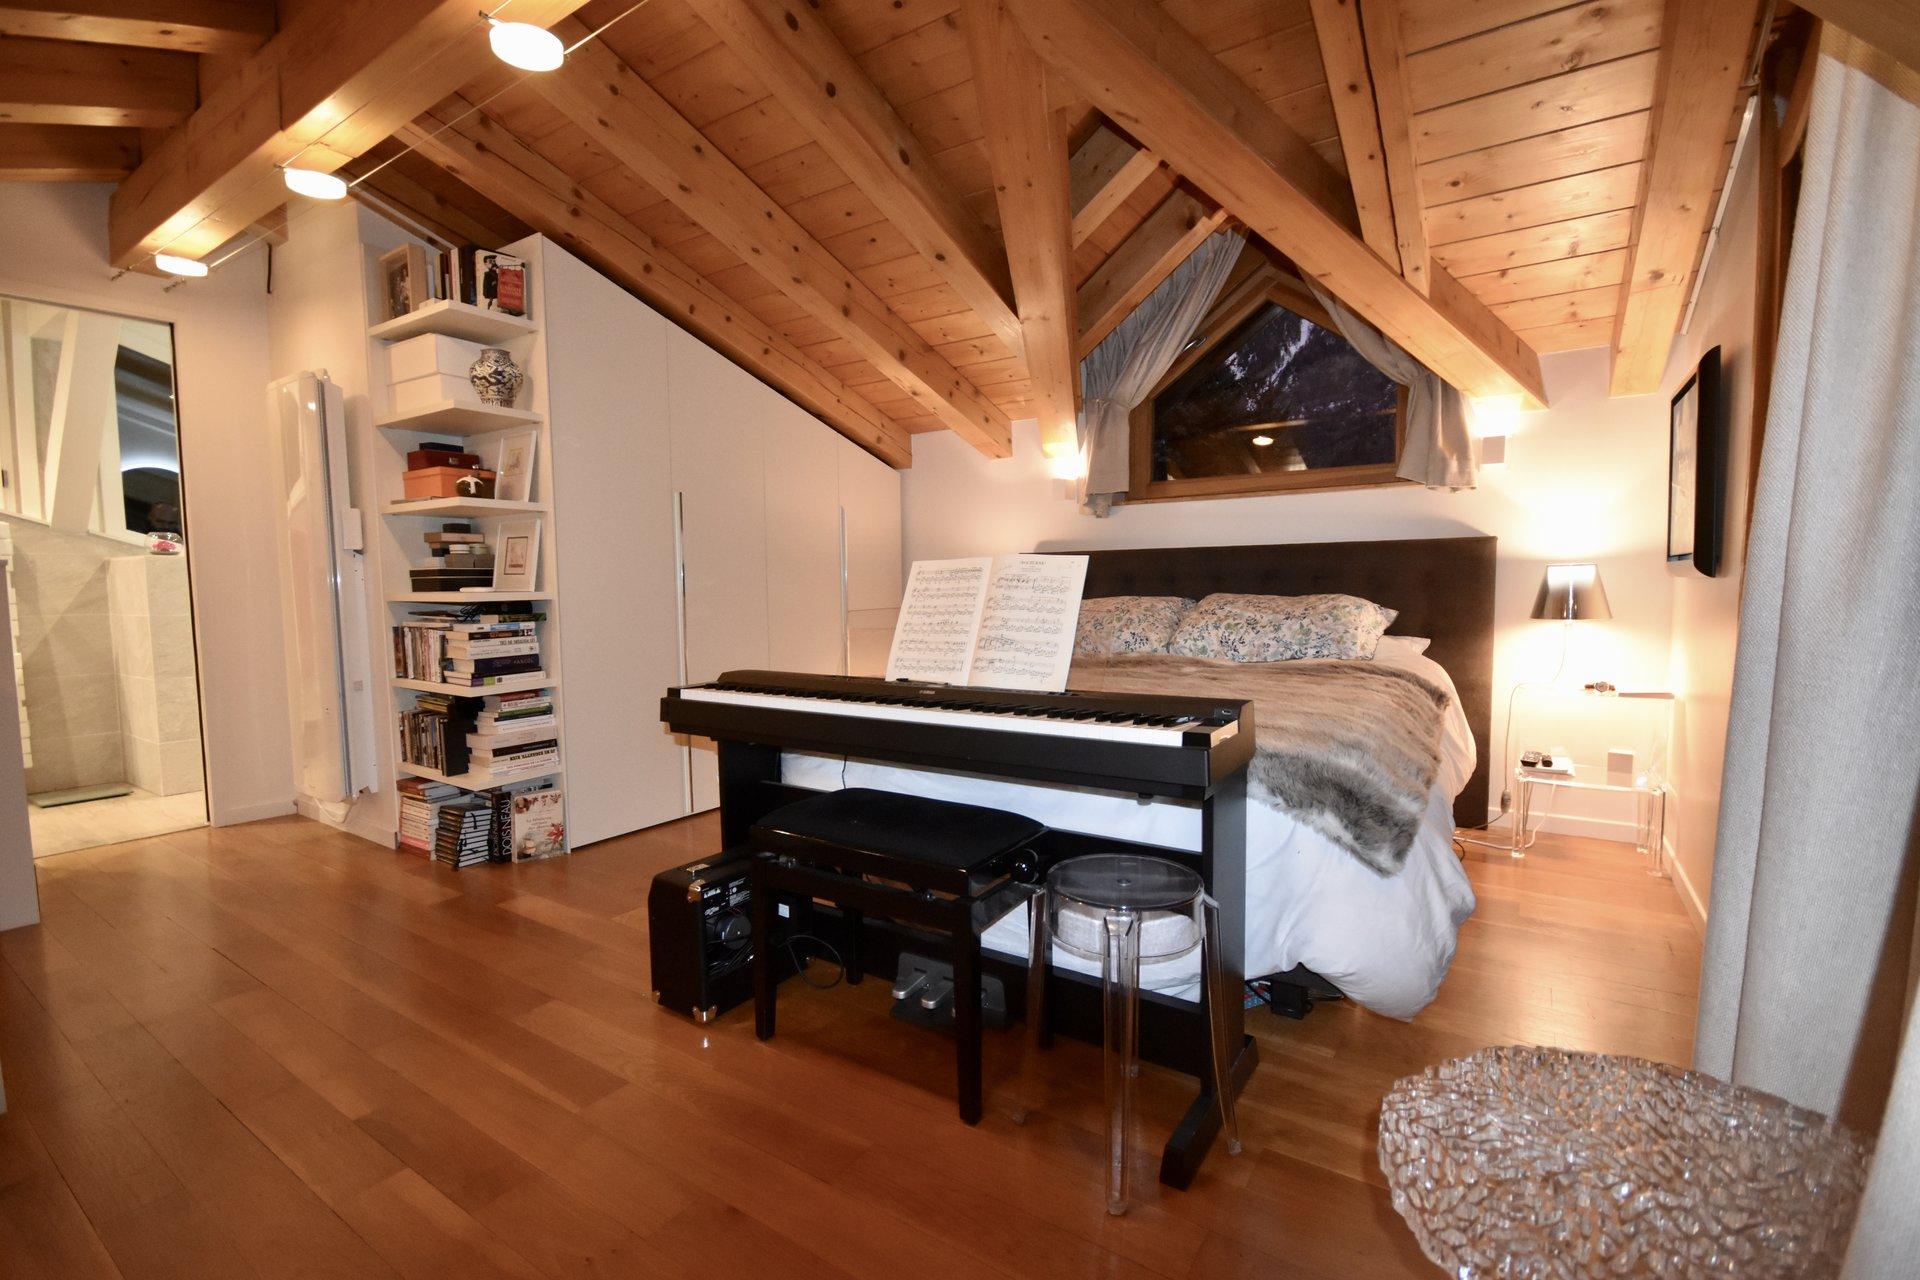 Sale Apartment - Chamonix-Mont-Blanc